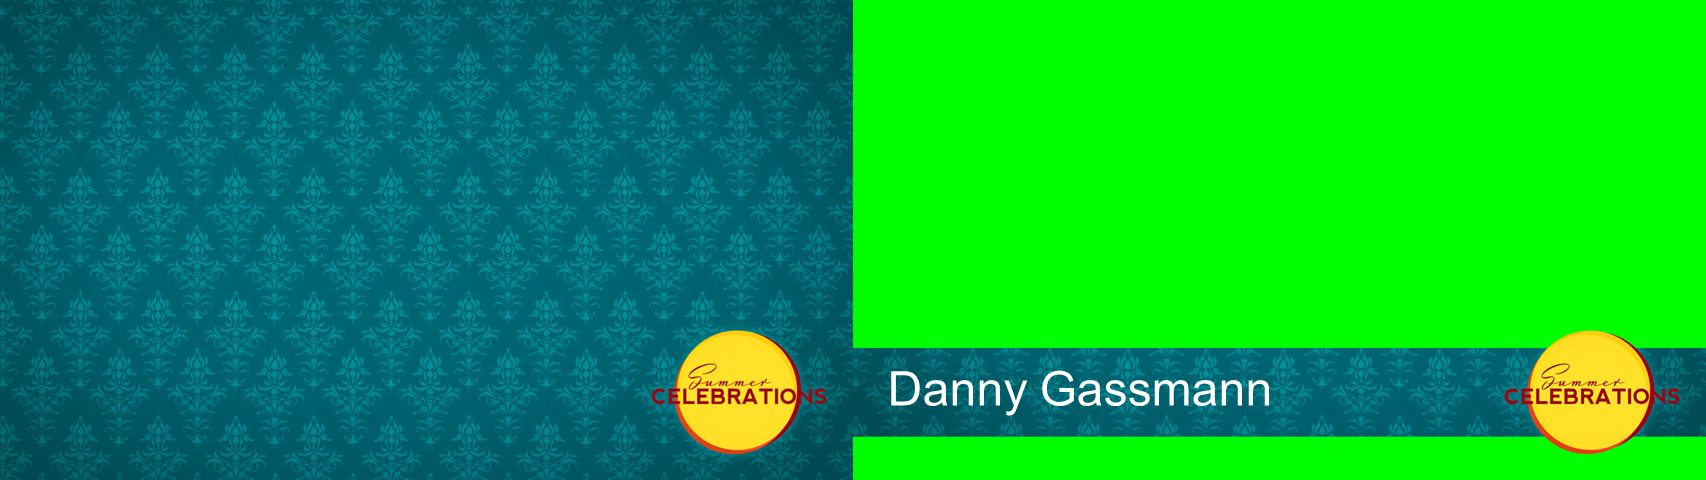 Danny Gassmann